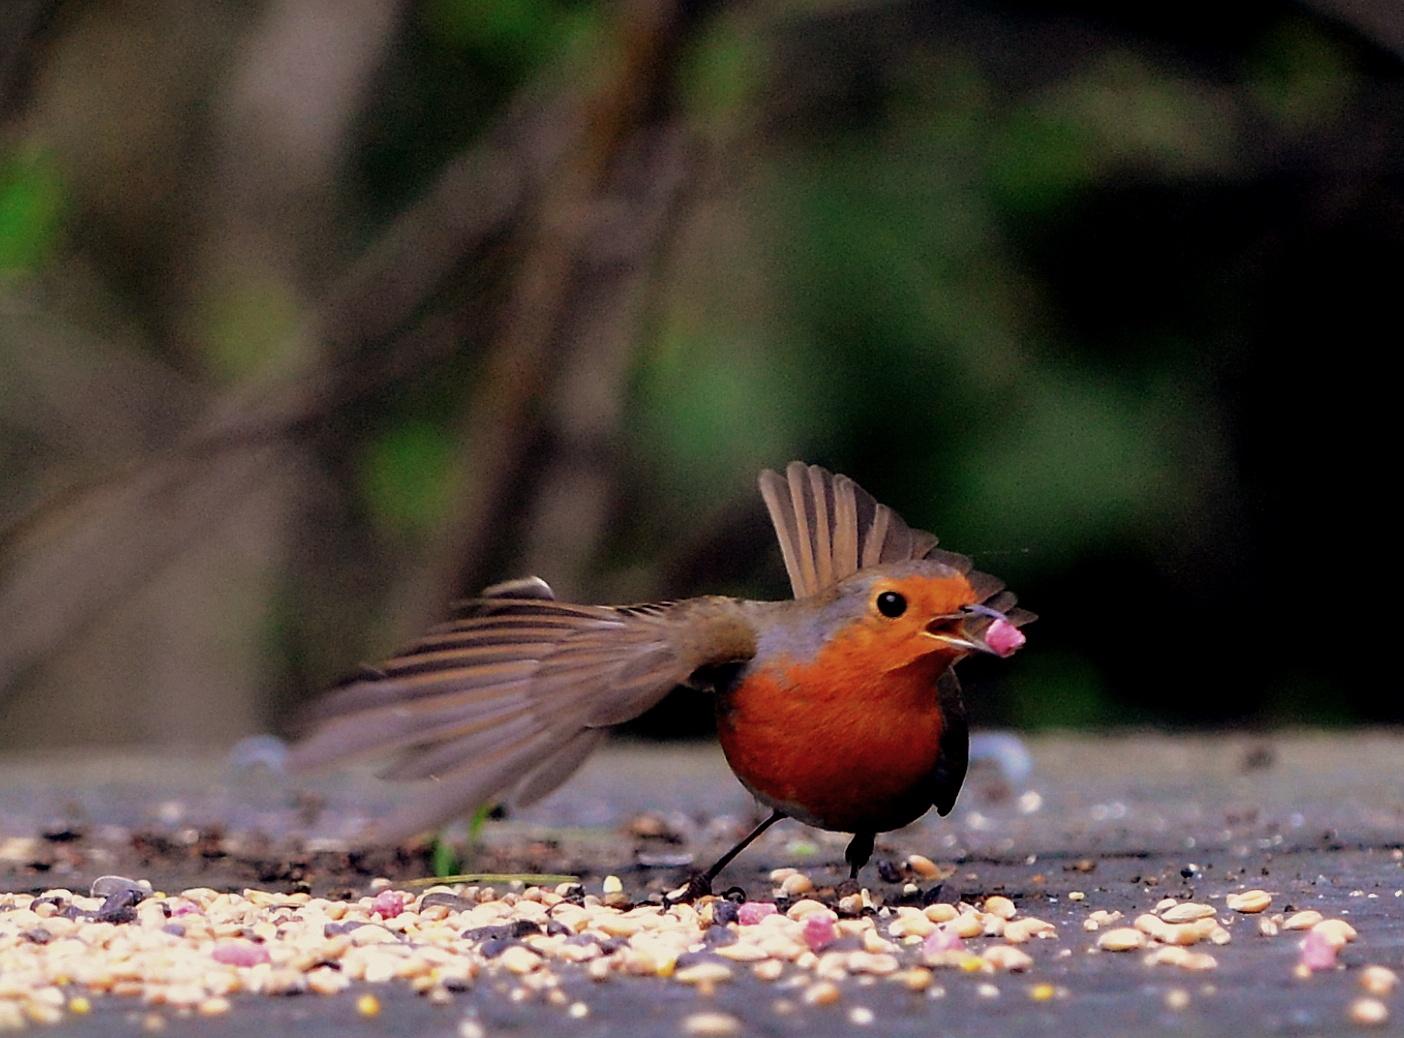 Just a Robin by Chris Brian Hollingworth